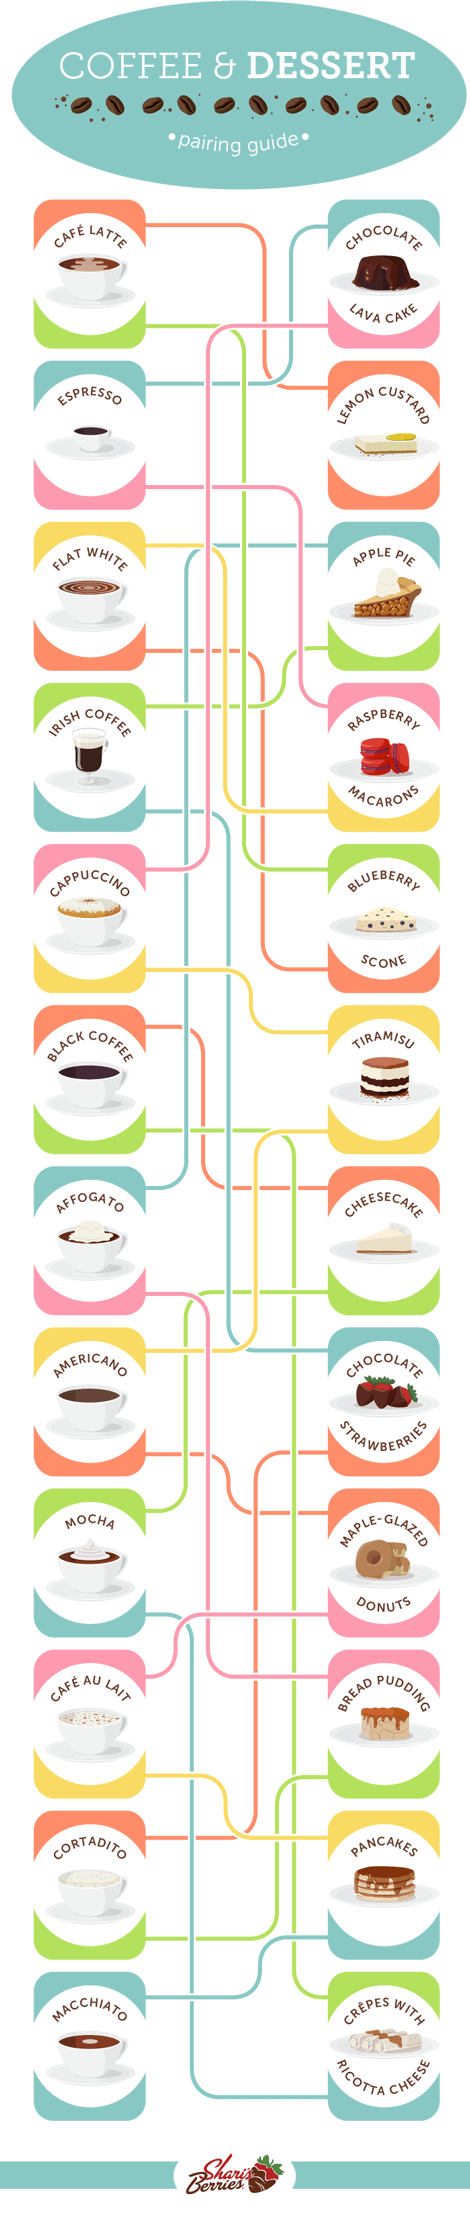 coffee-desserts